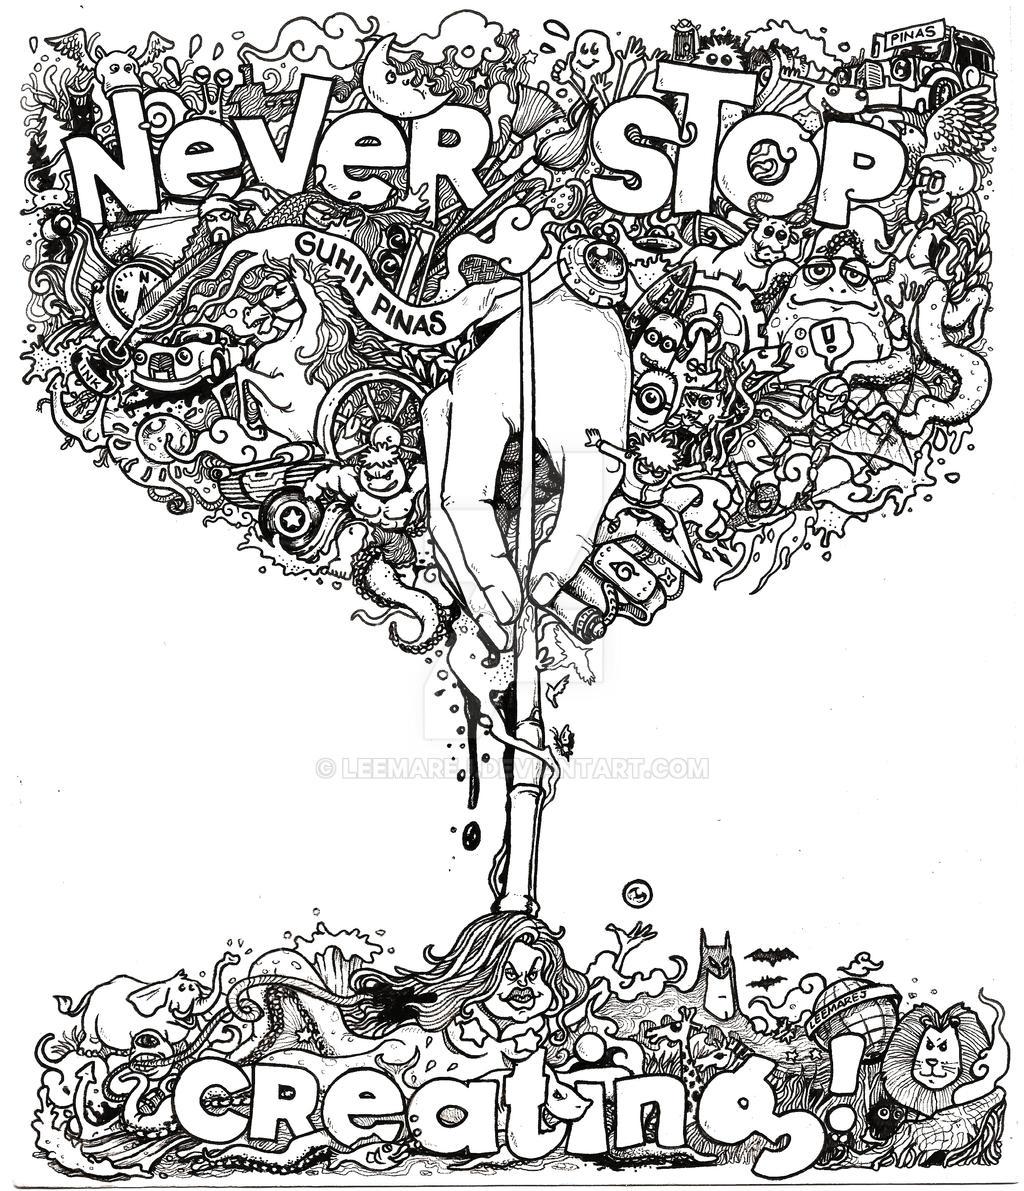 Doodle never stop creating by leemarej on deviantart